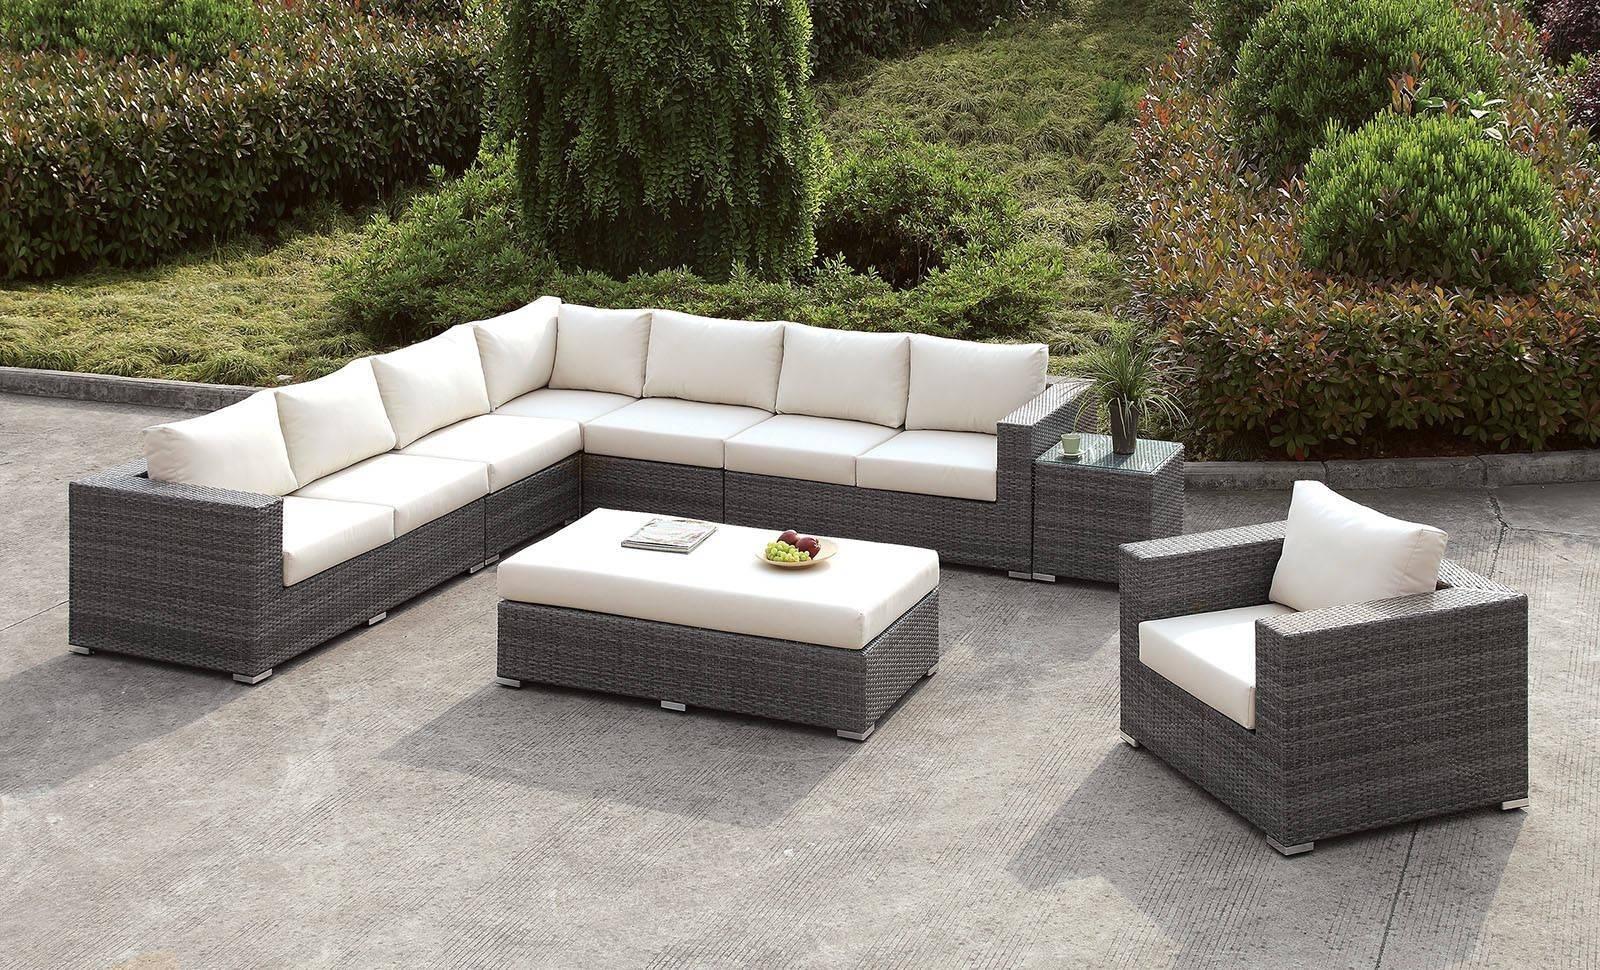 Furniture of America Somani Outdoor Sectional Sofa Set 8 Pcs in Ivory,  Aluminium